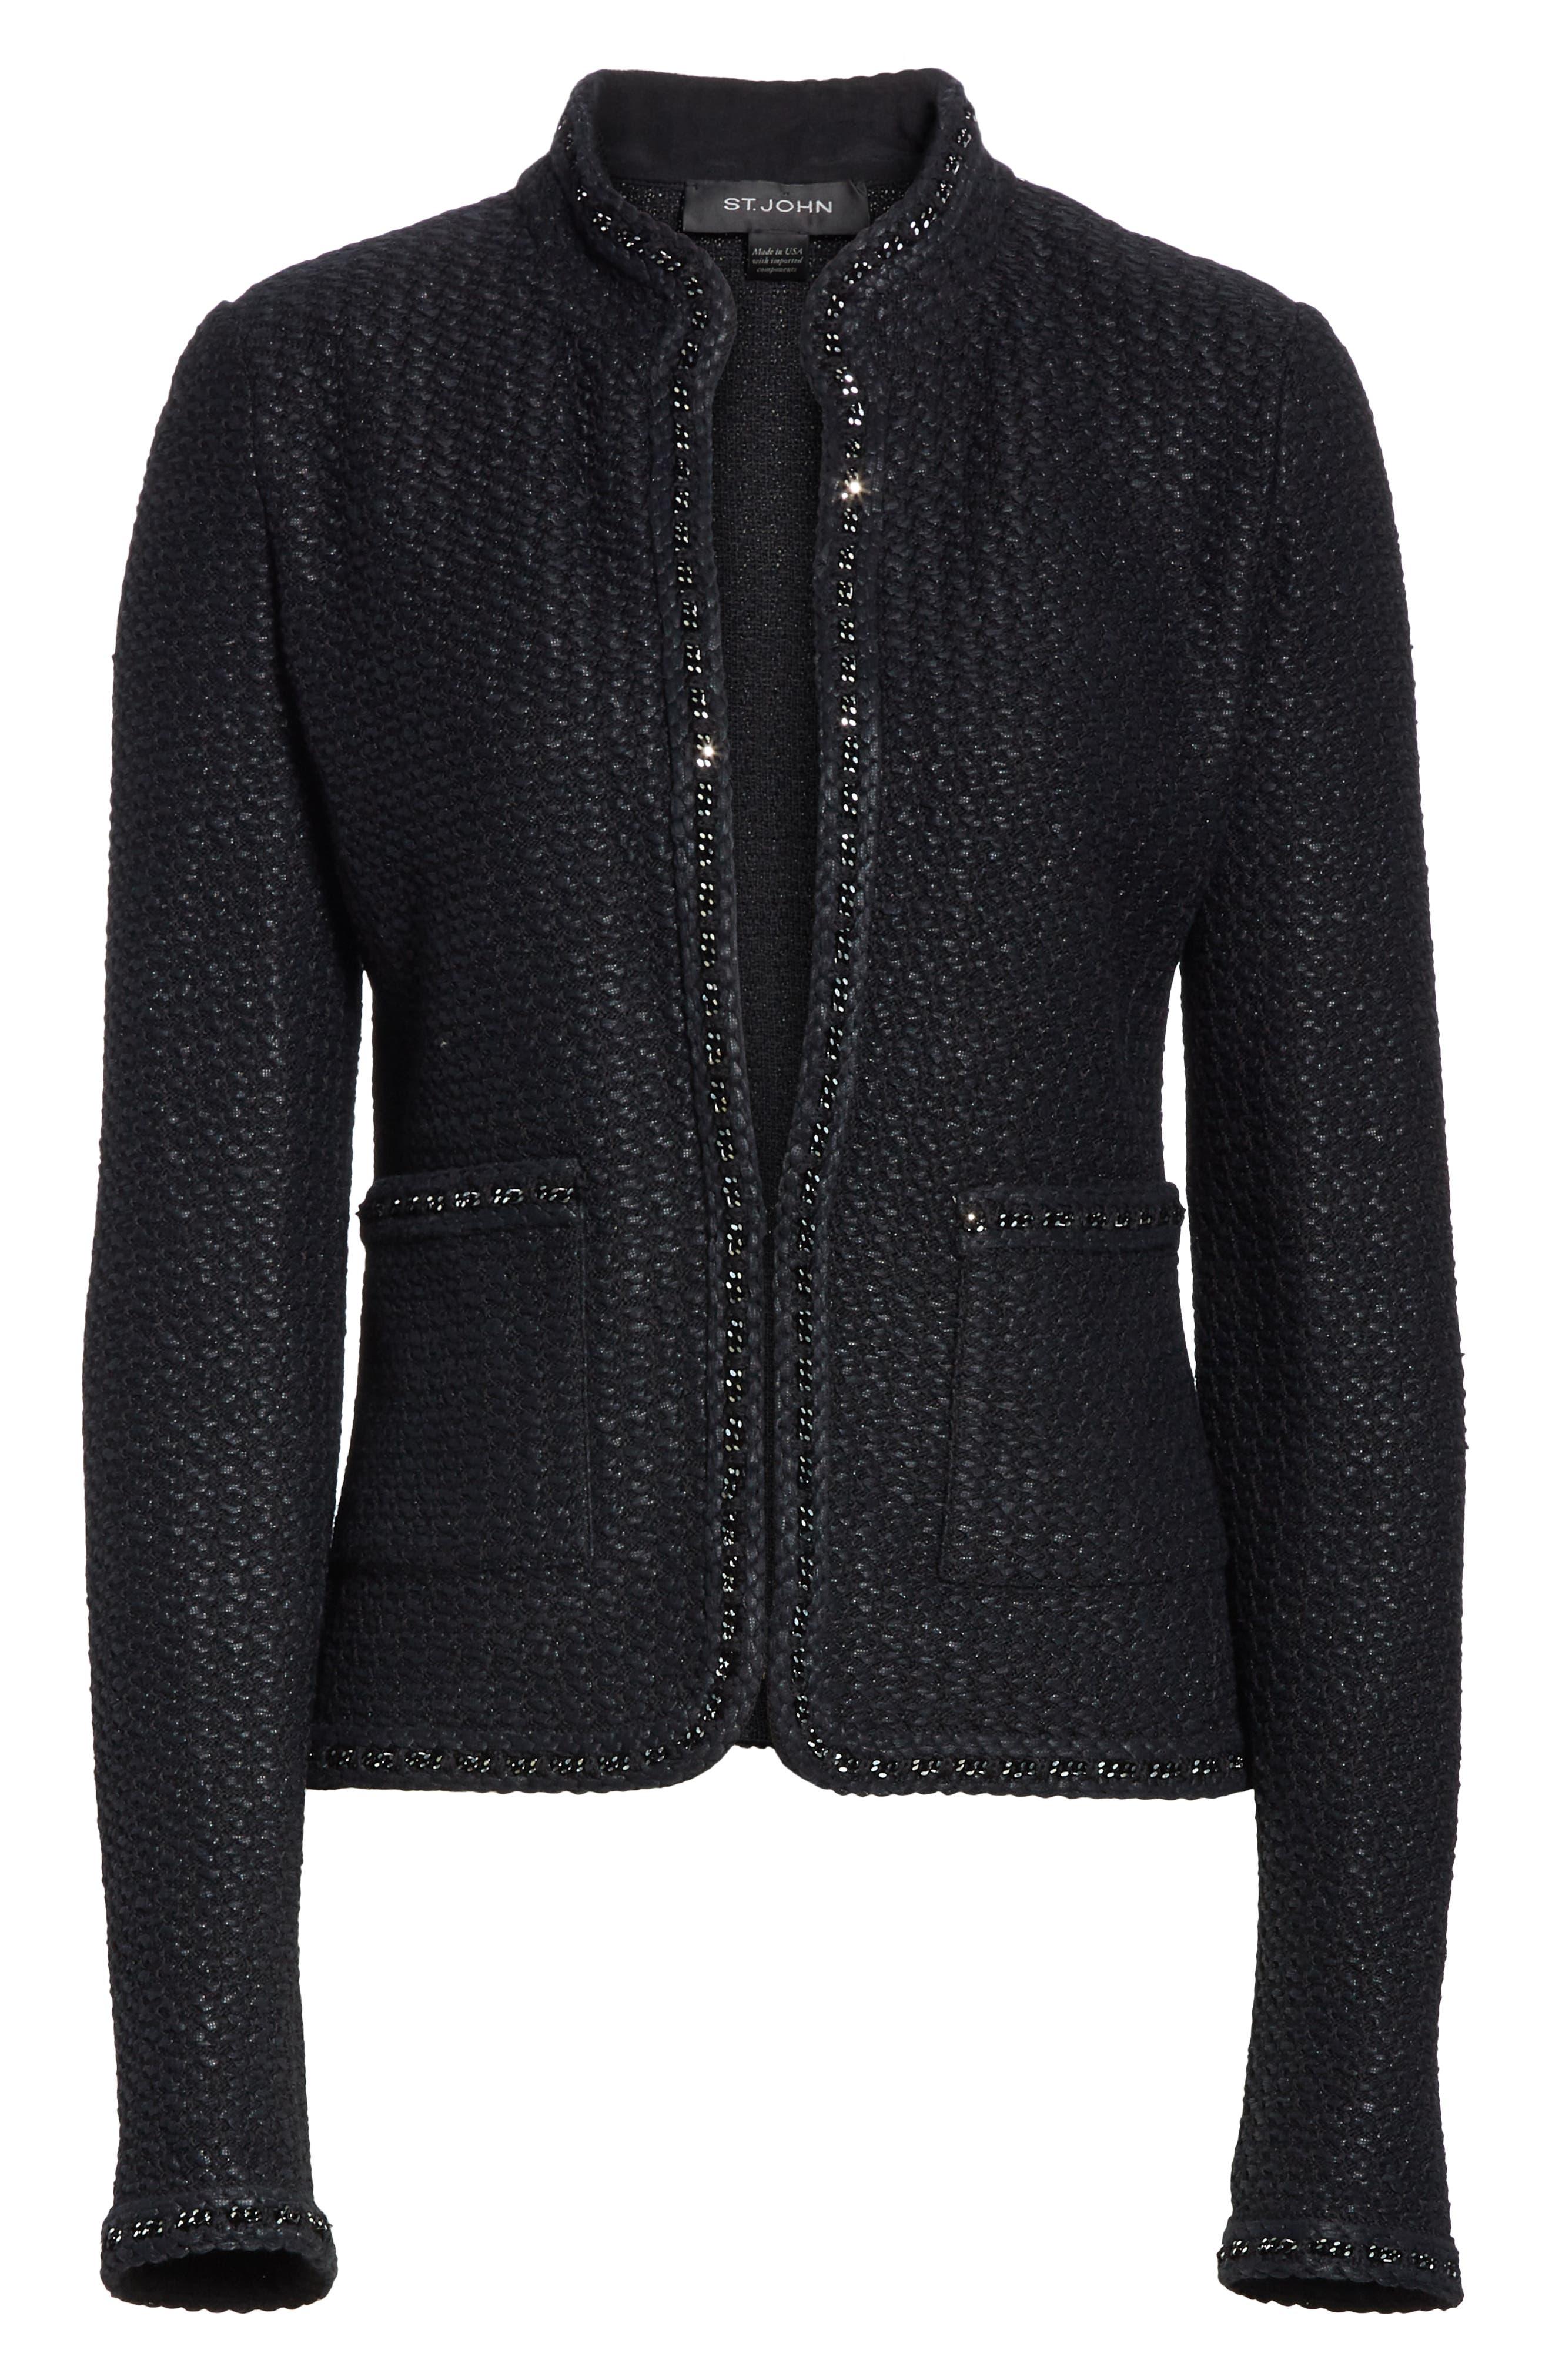 Adina Knit Short Jacket,                             Alternate thumbnail 5, color,                             CAVIAR